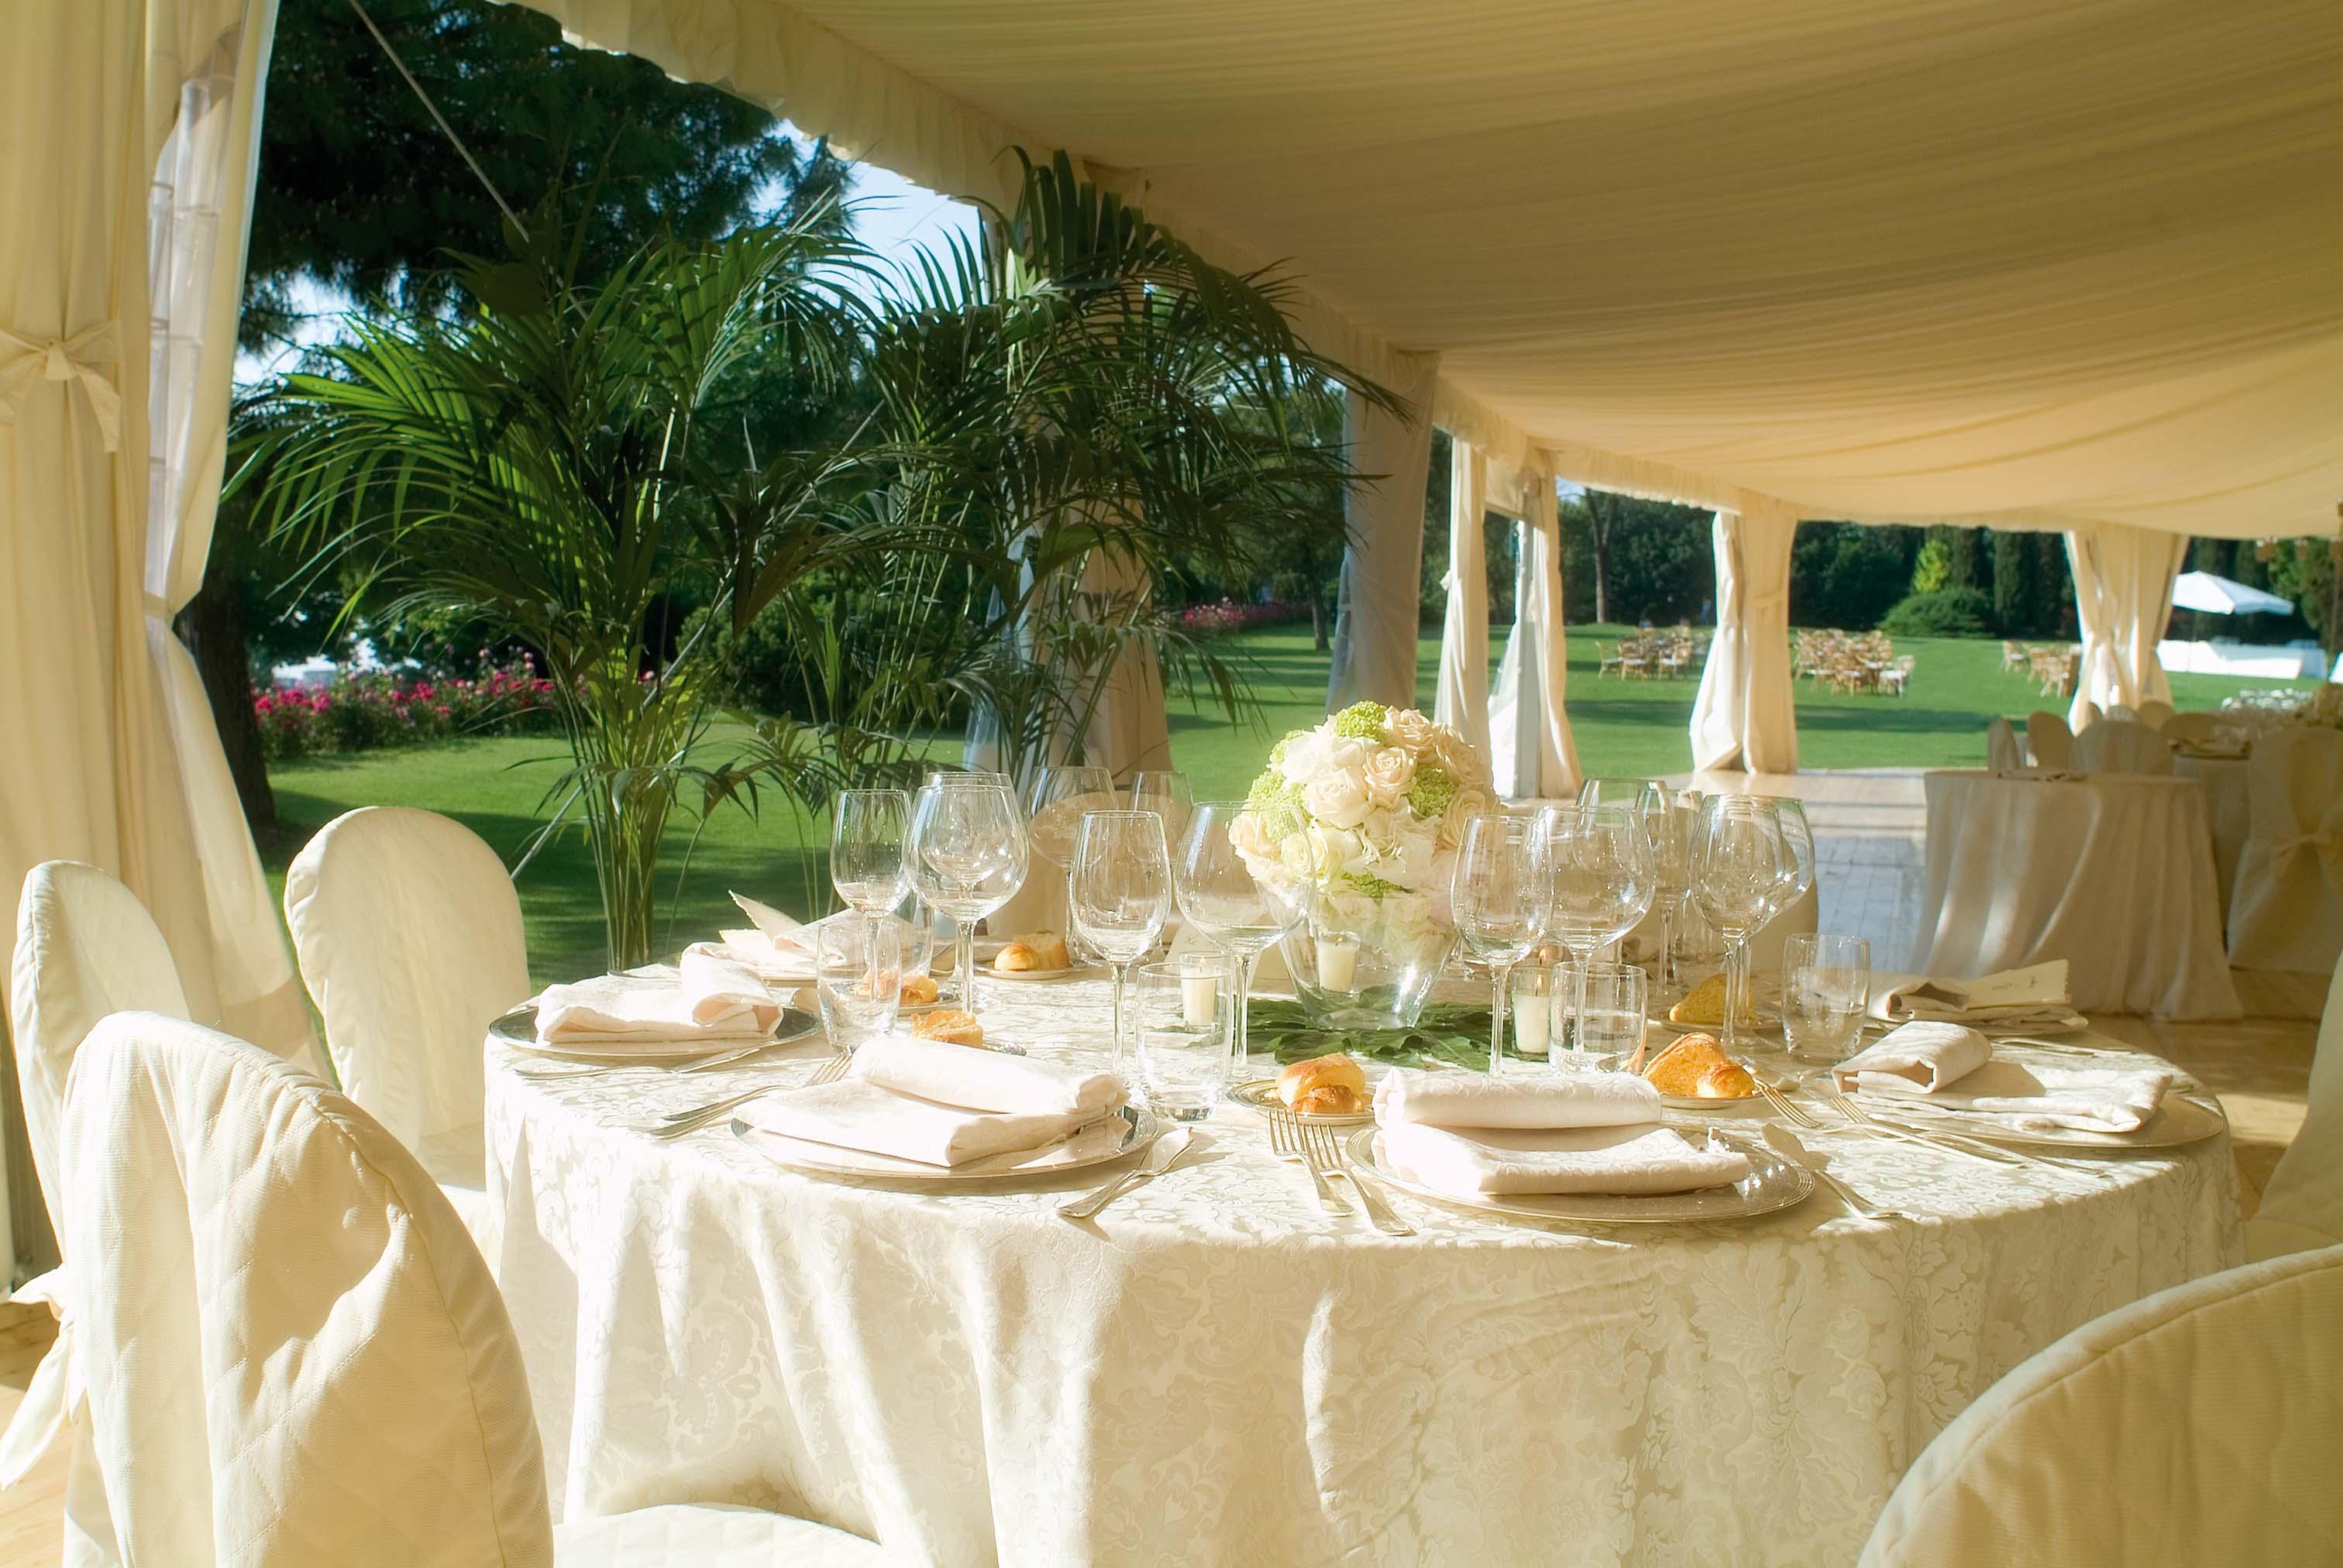 Matrimonio In Verona : Costo matrimonio a verona